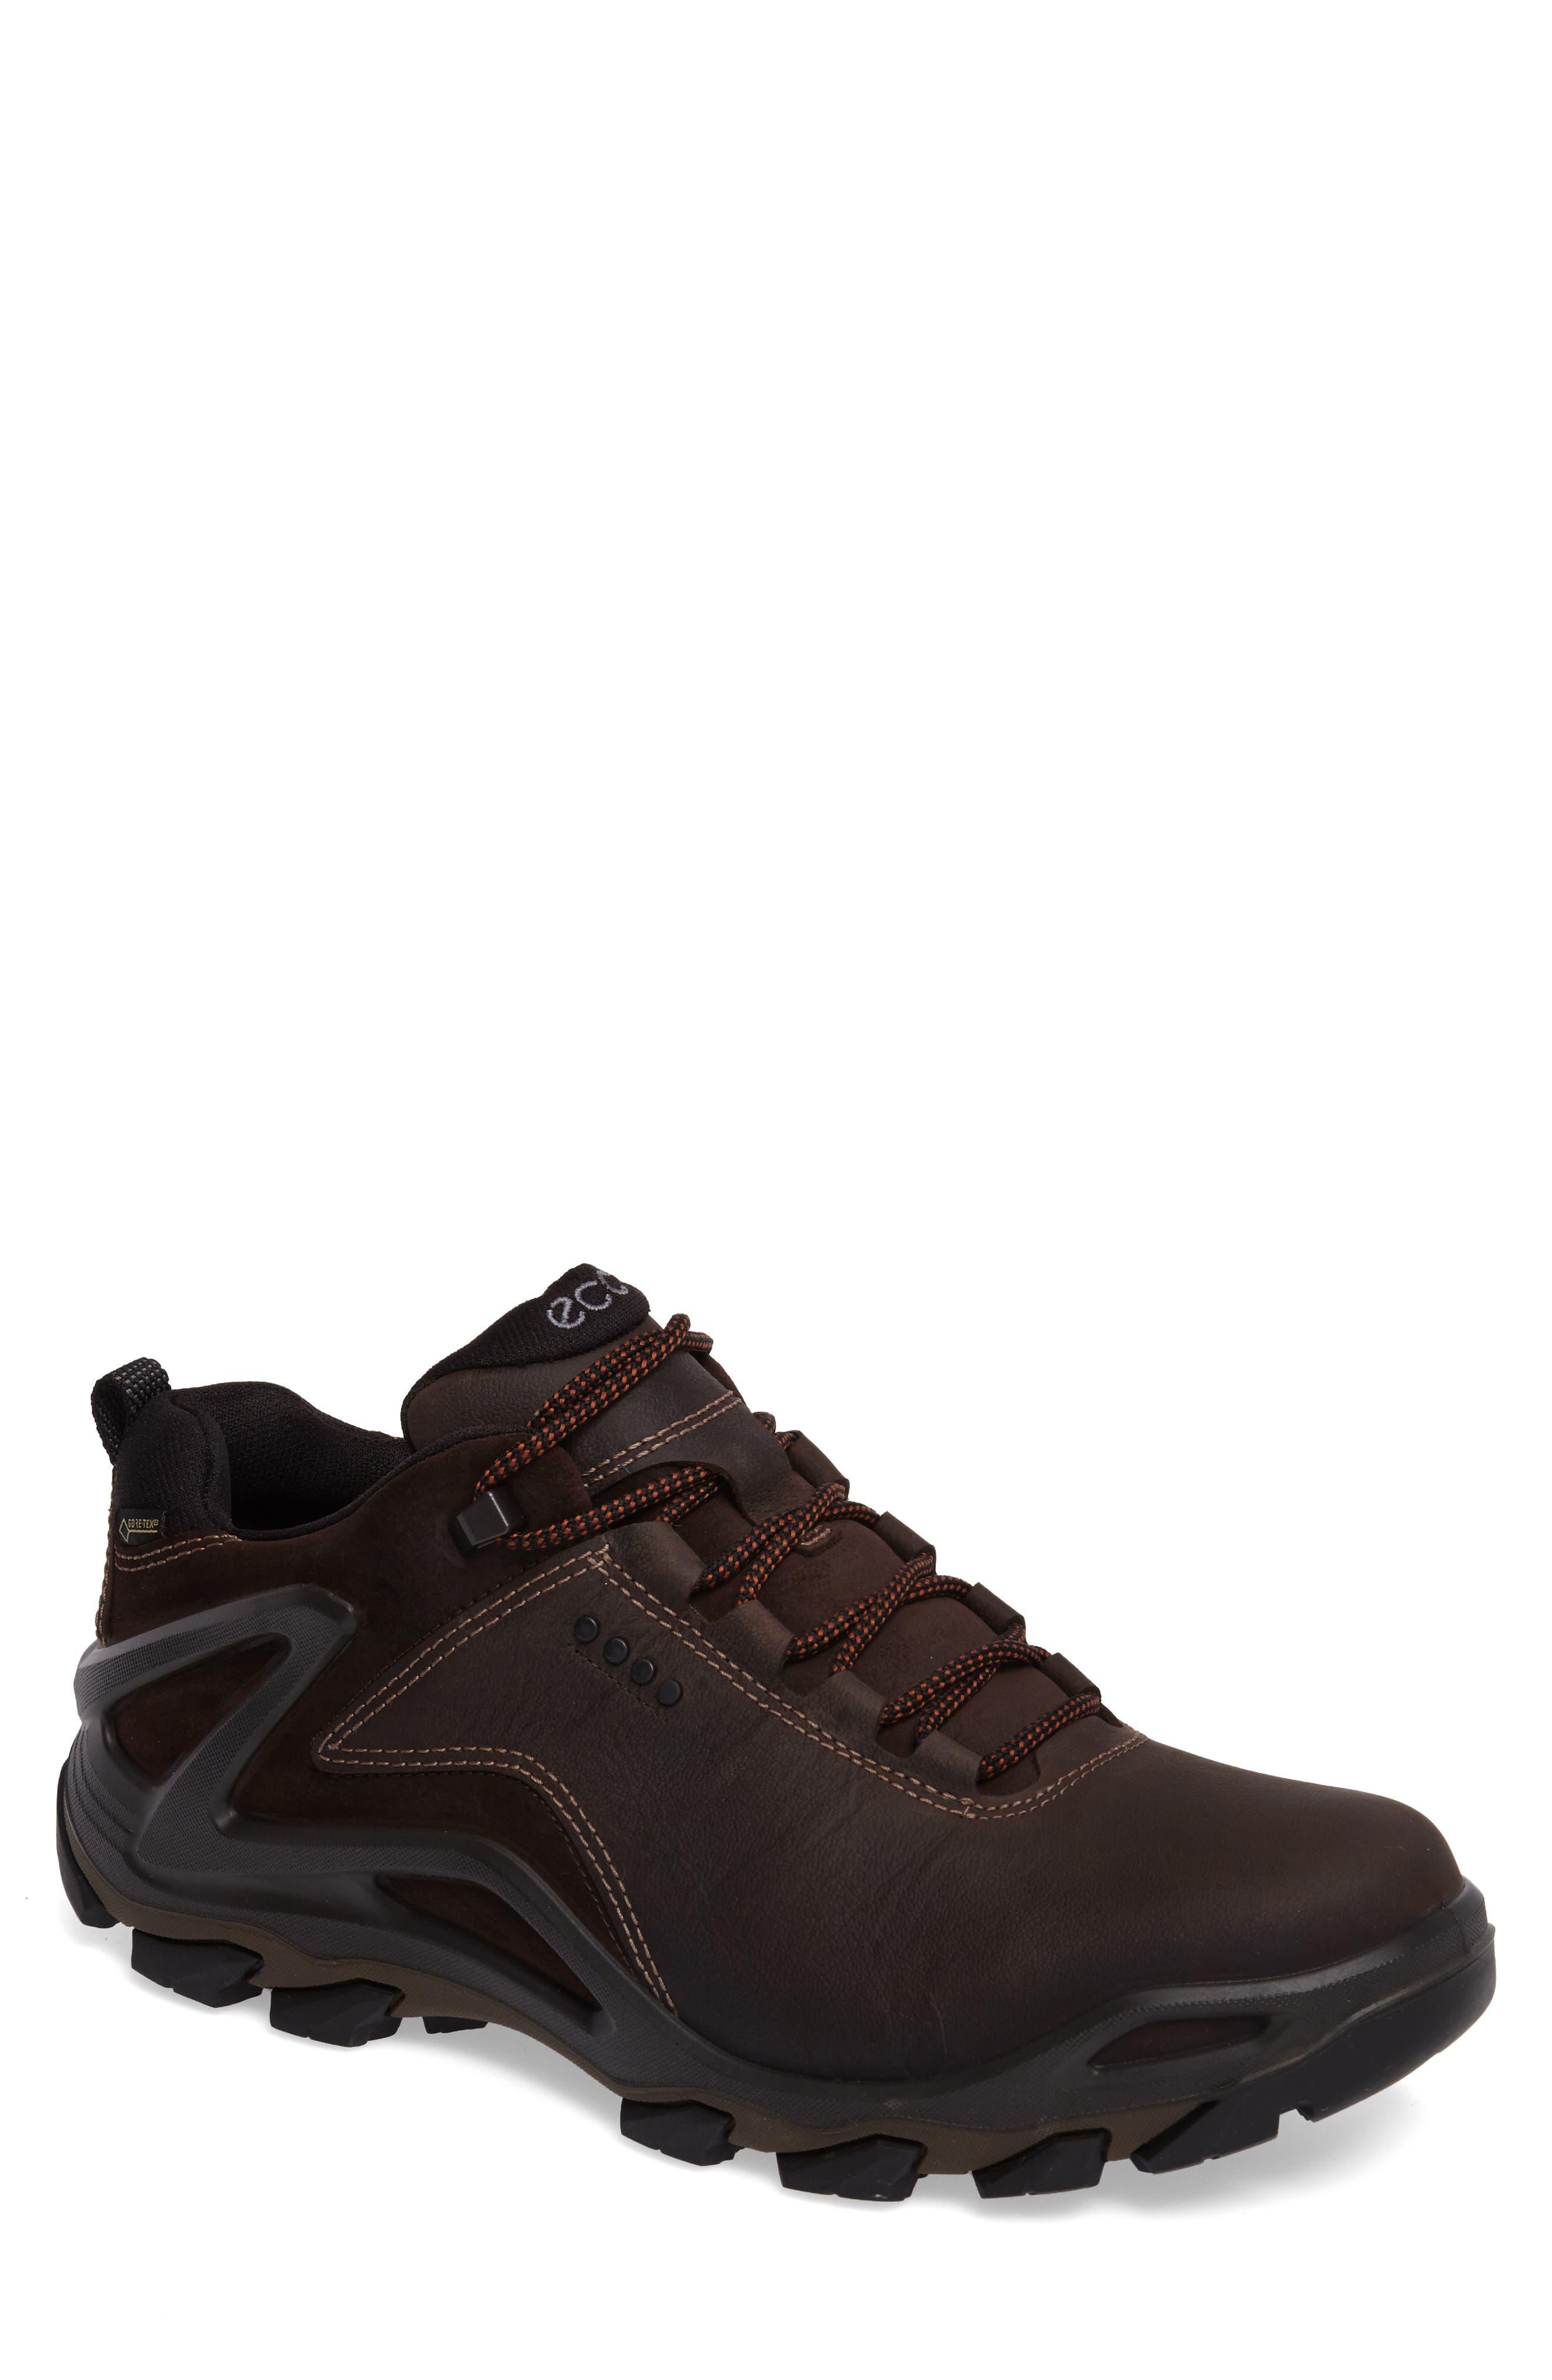 Terra Evo GTX Low Hiking Shoe,                         Main,                         color, Coffee/ Mocha Nubuck